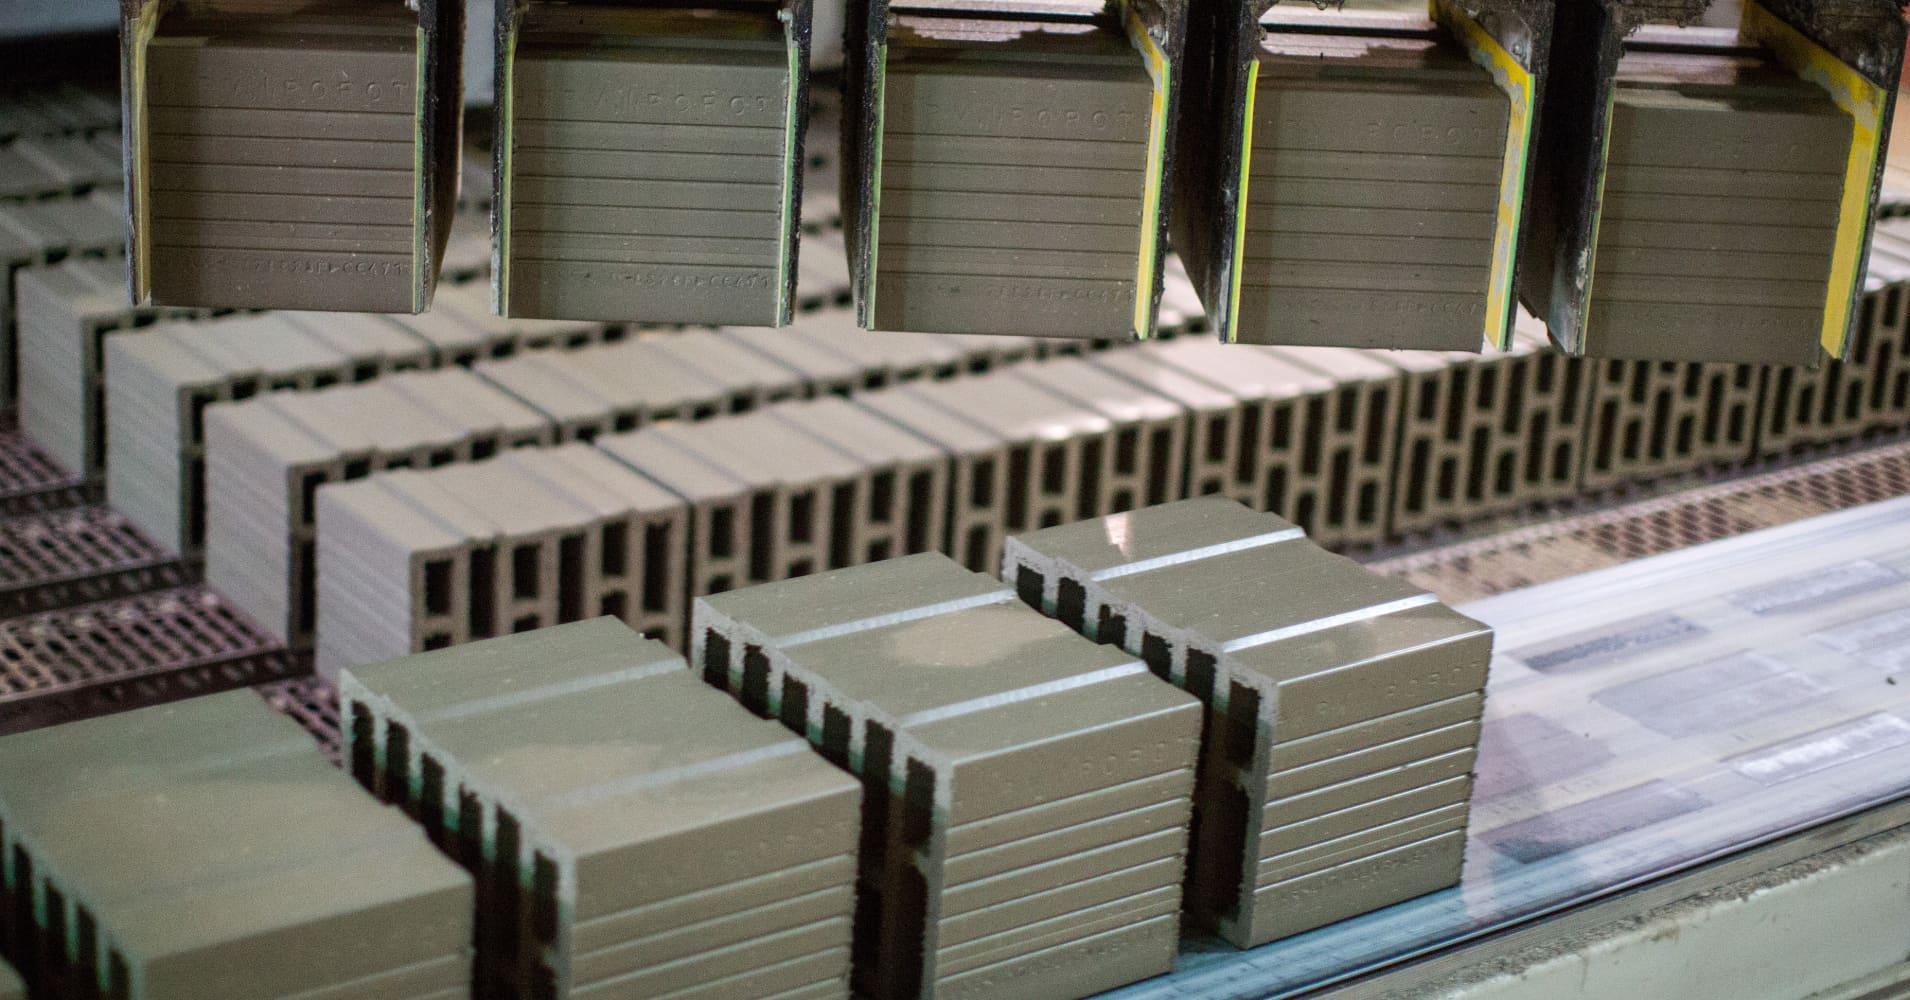 Cost savings, solid brick demand lift Wienerberger profit